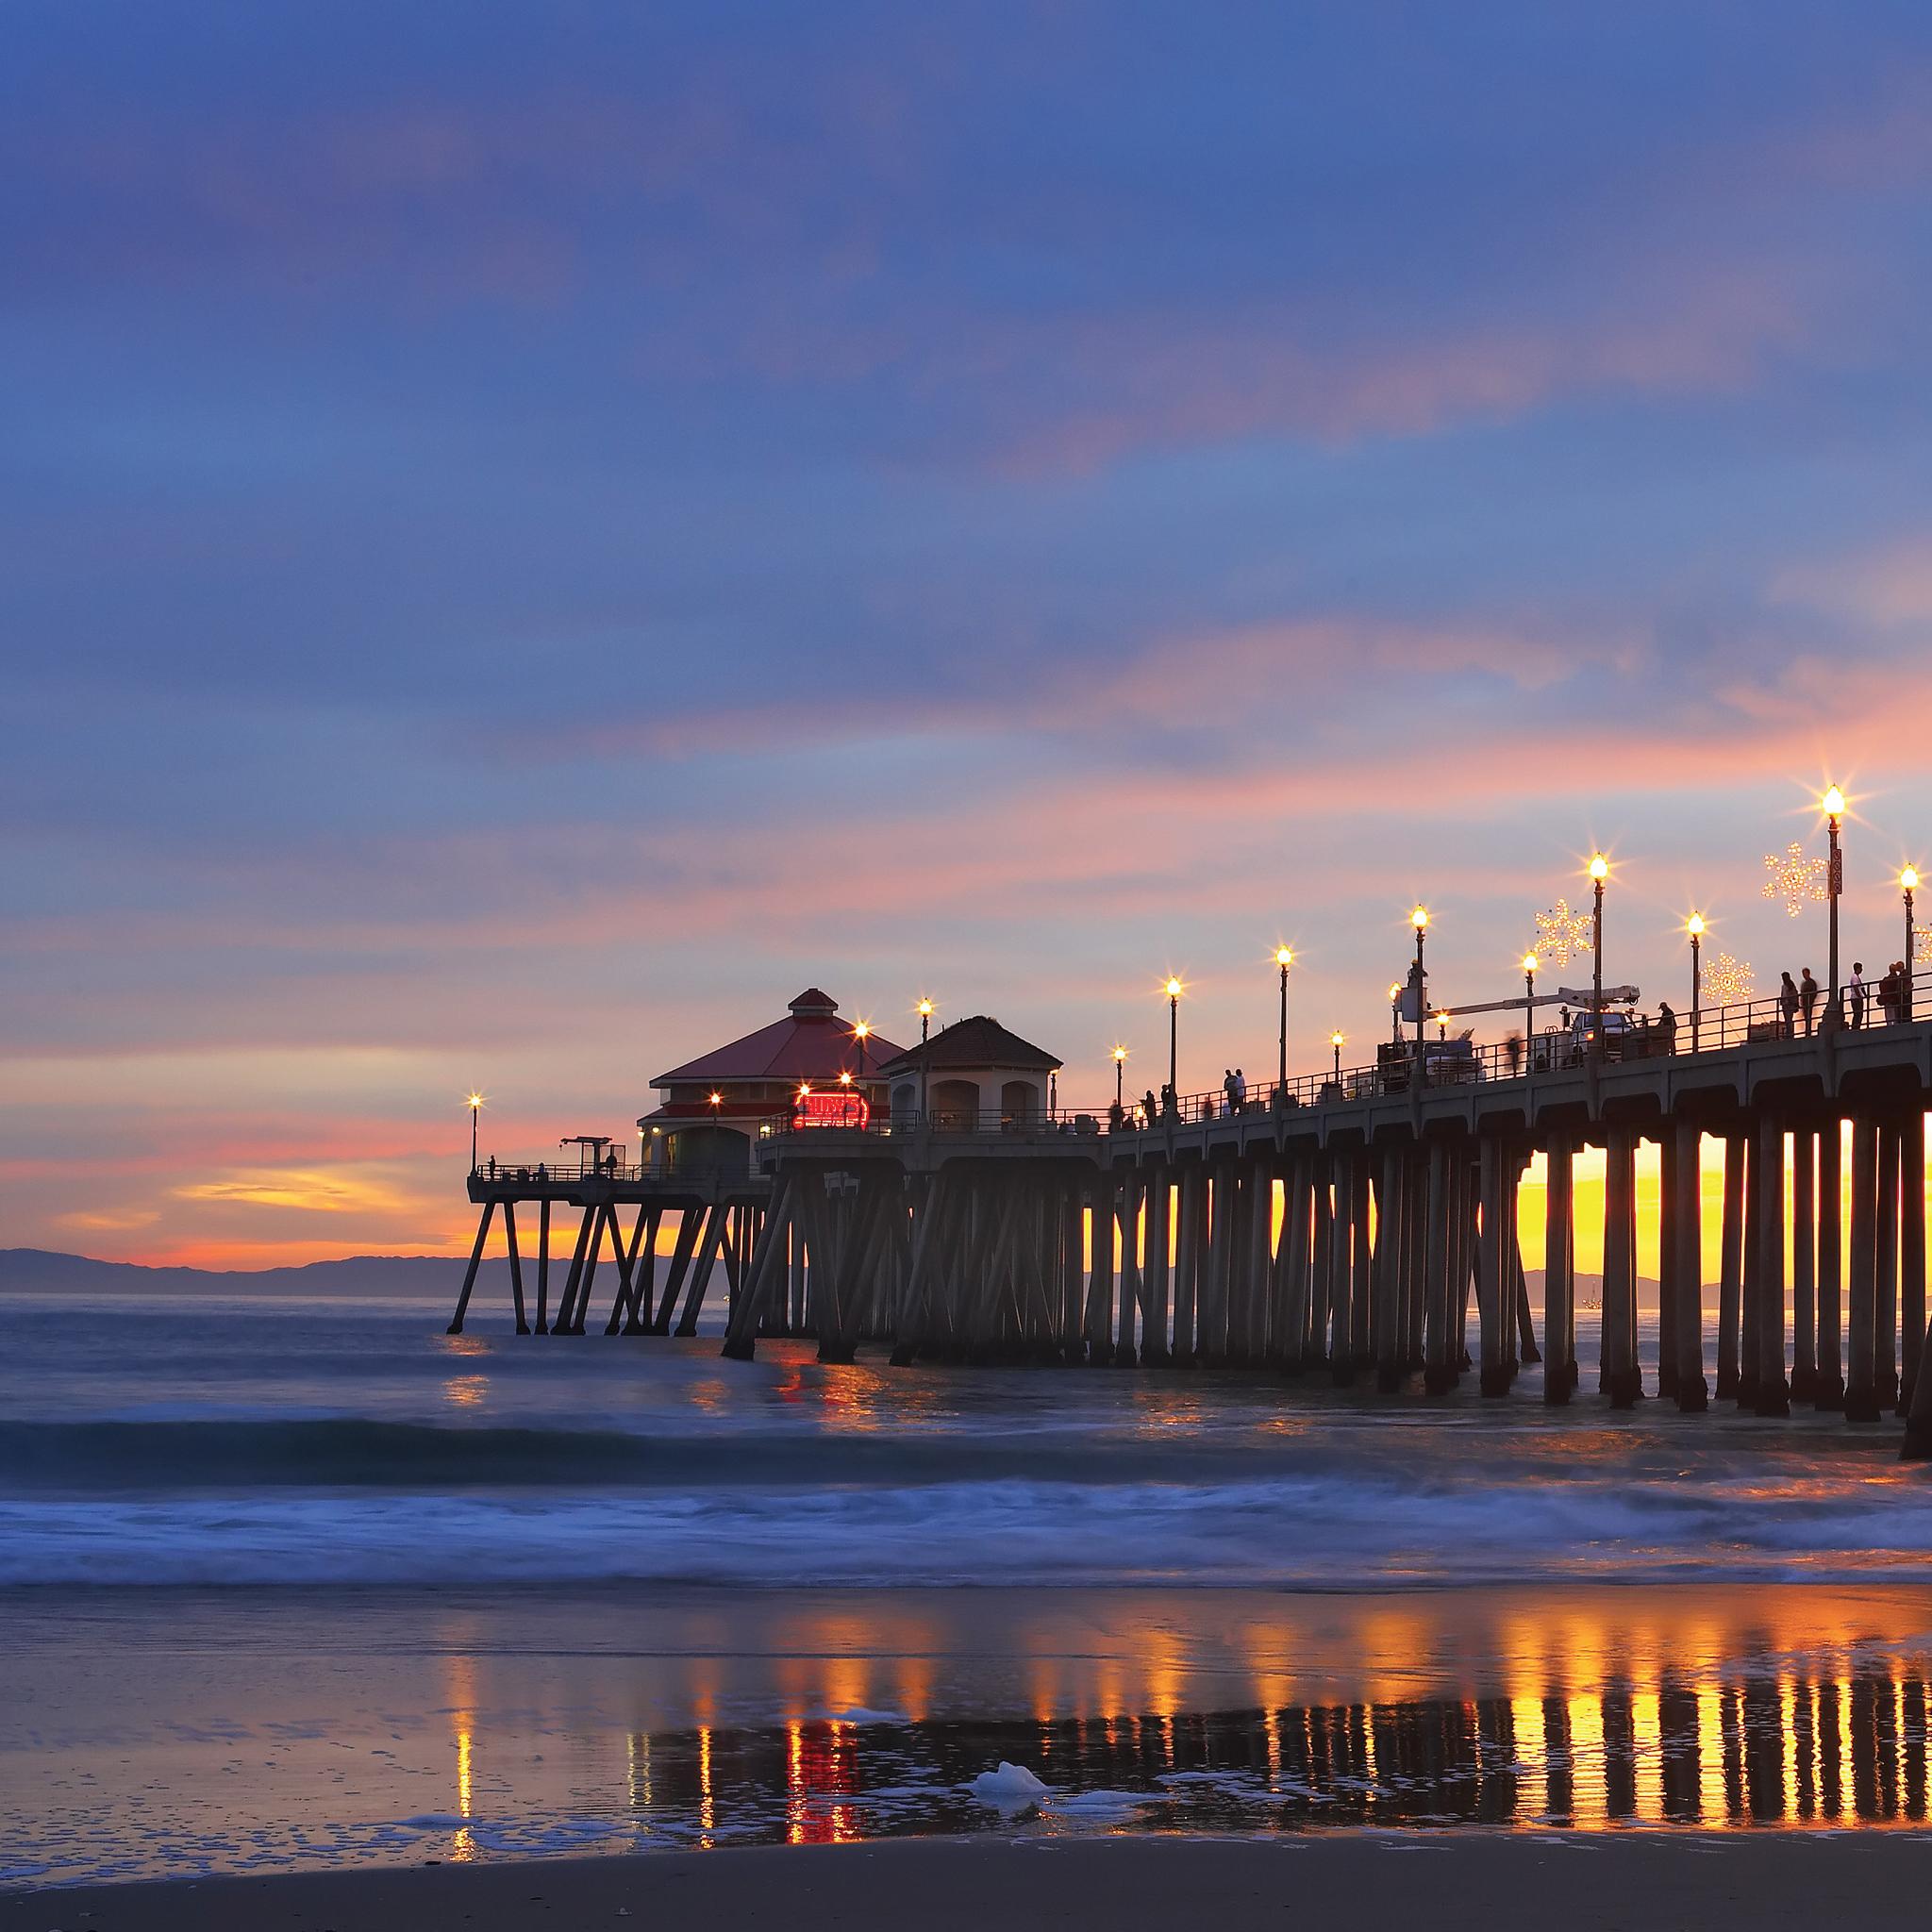 Bonfires-Huntington-Beach-3Wallpapers-iPad-Retina